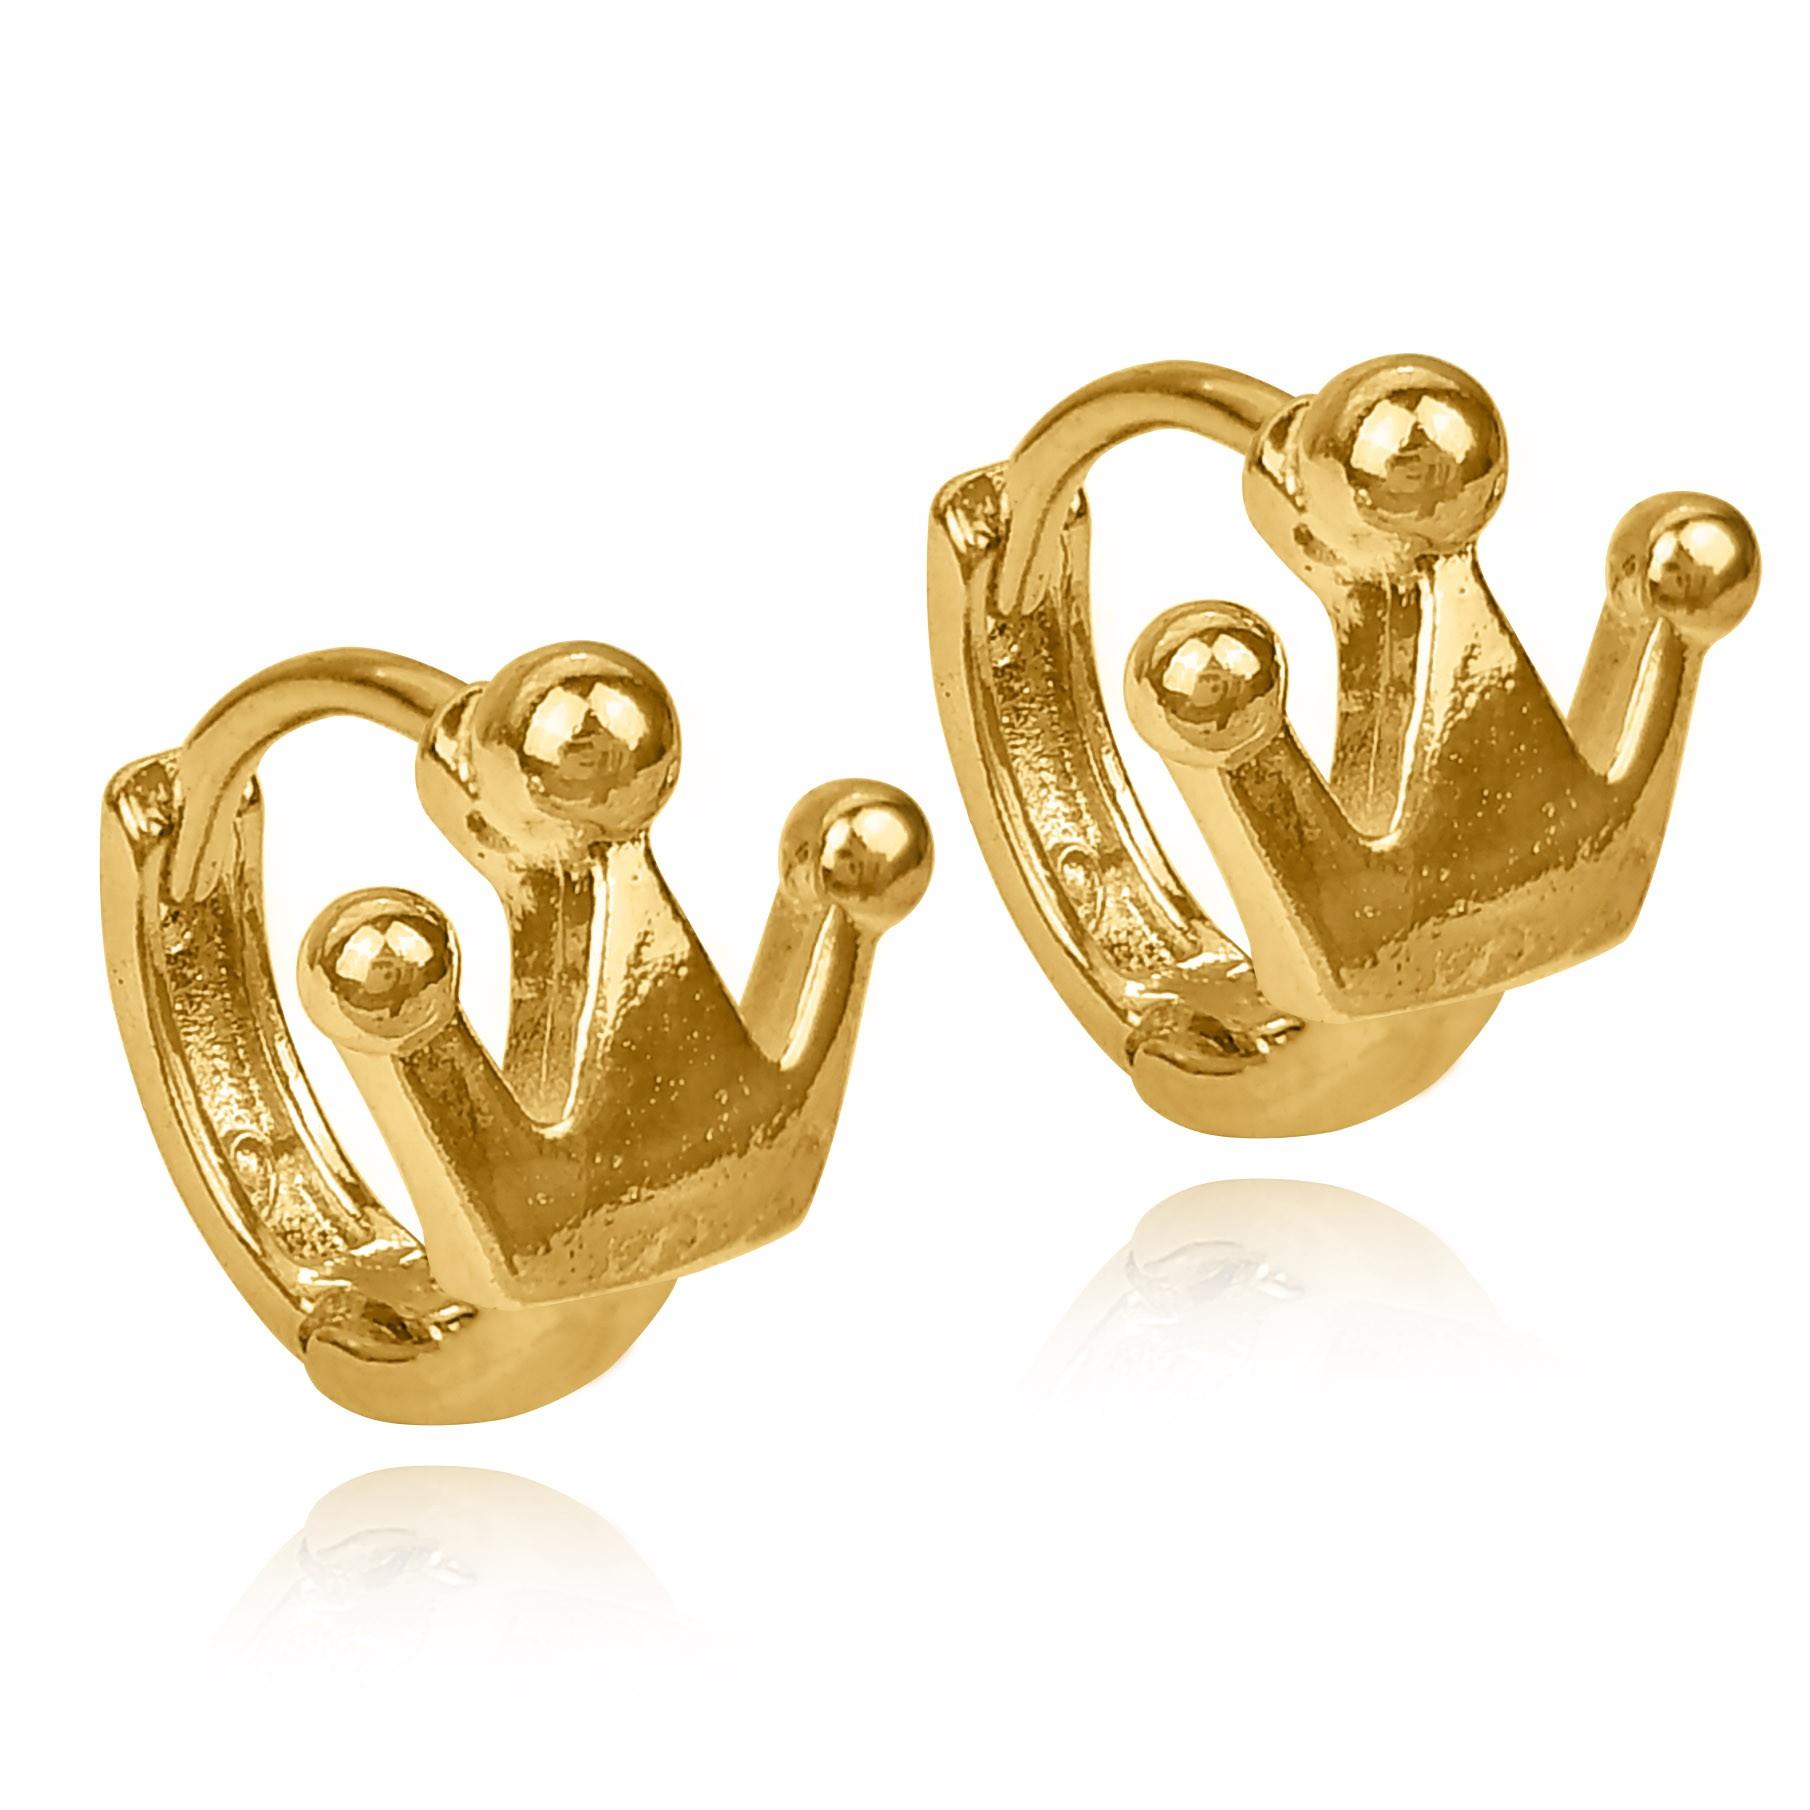 Brinco Argola Coroa Lisa Folheado a Ouro 18k  - Lunozê Joias